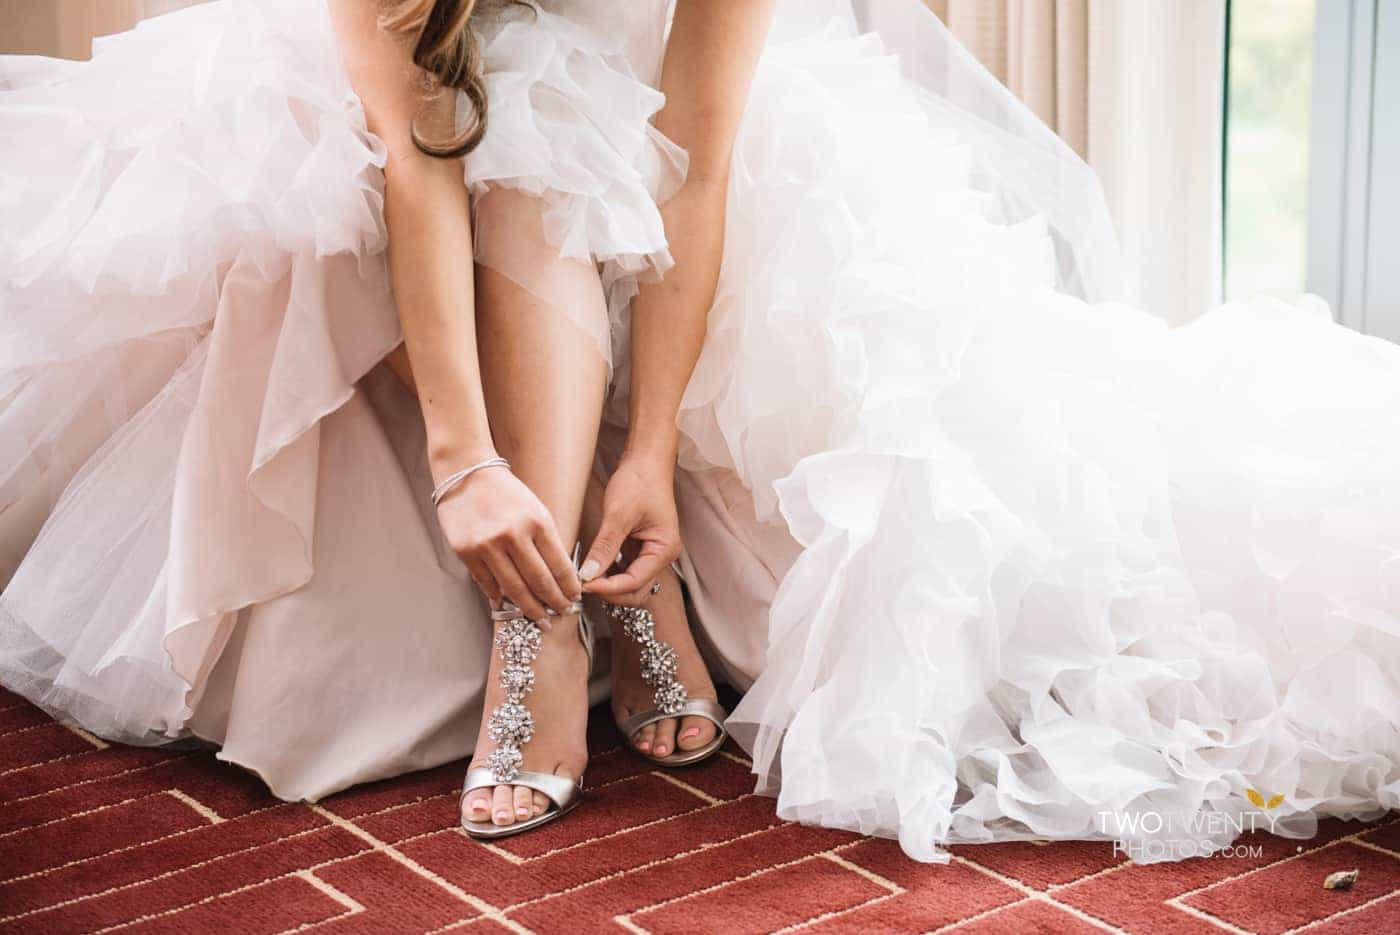 hyatt-regency-downtown-sacramento-wedding-photographer-23